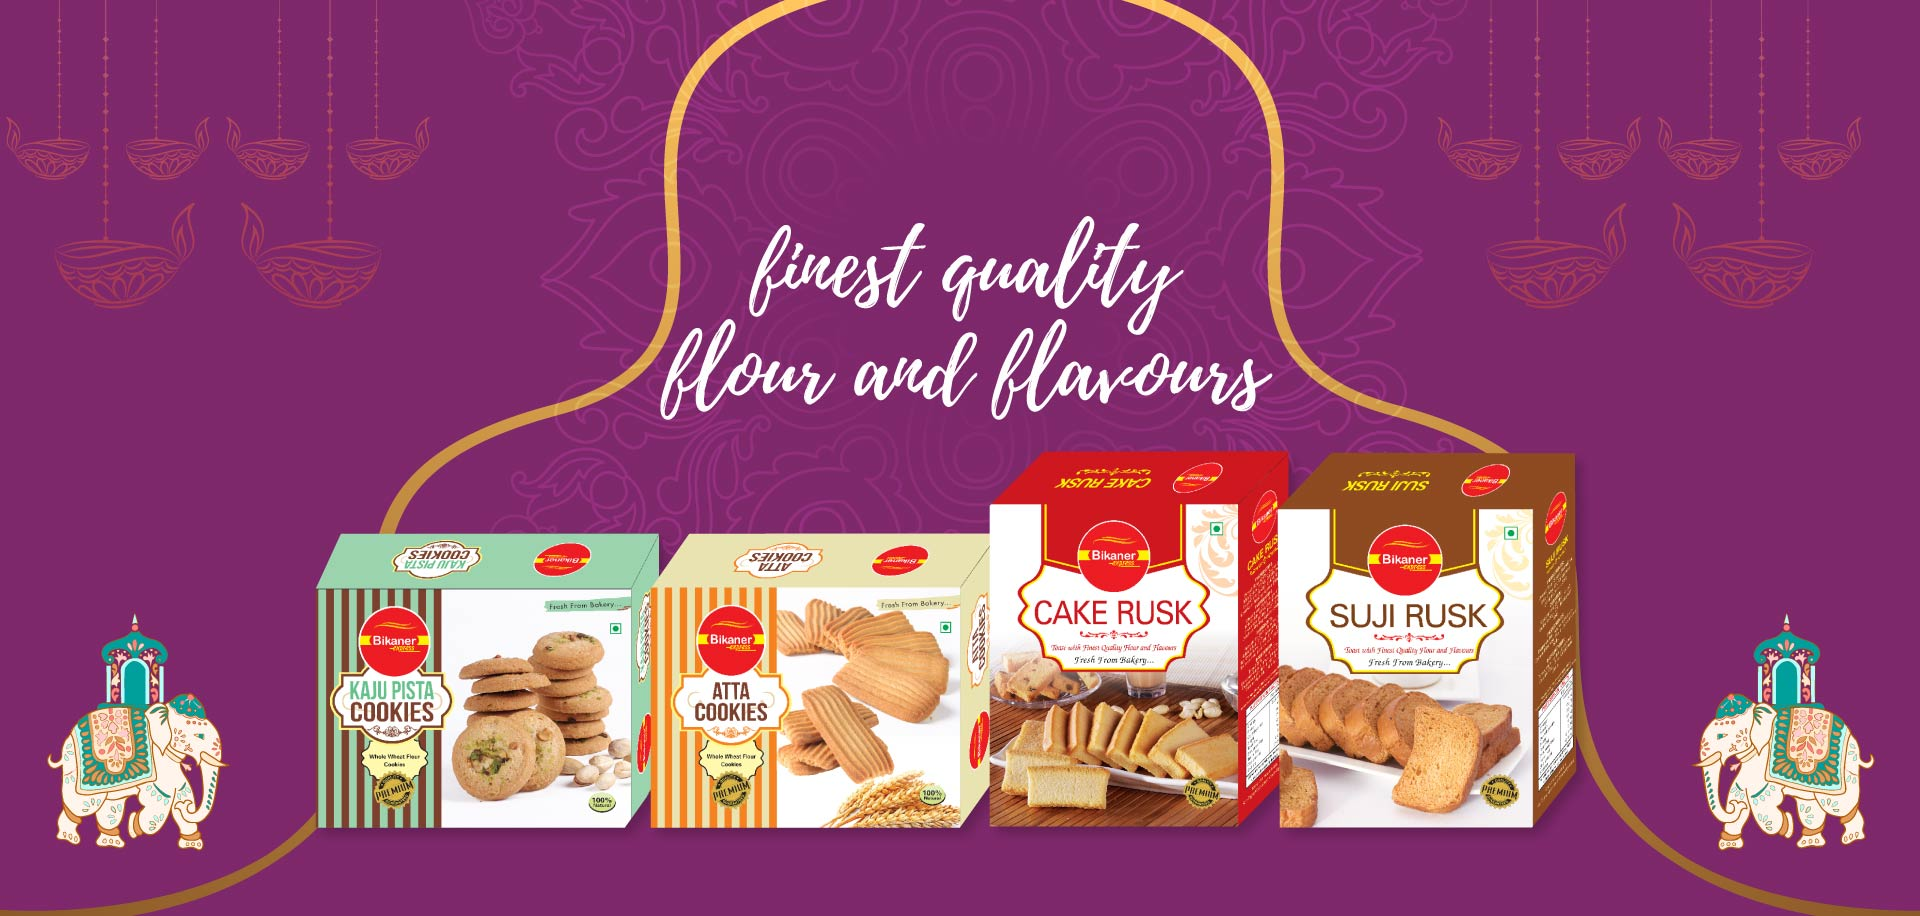 Bikaner Express Rusk & Cookies